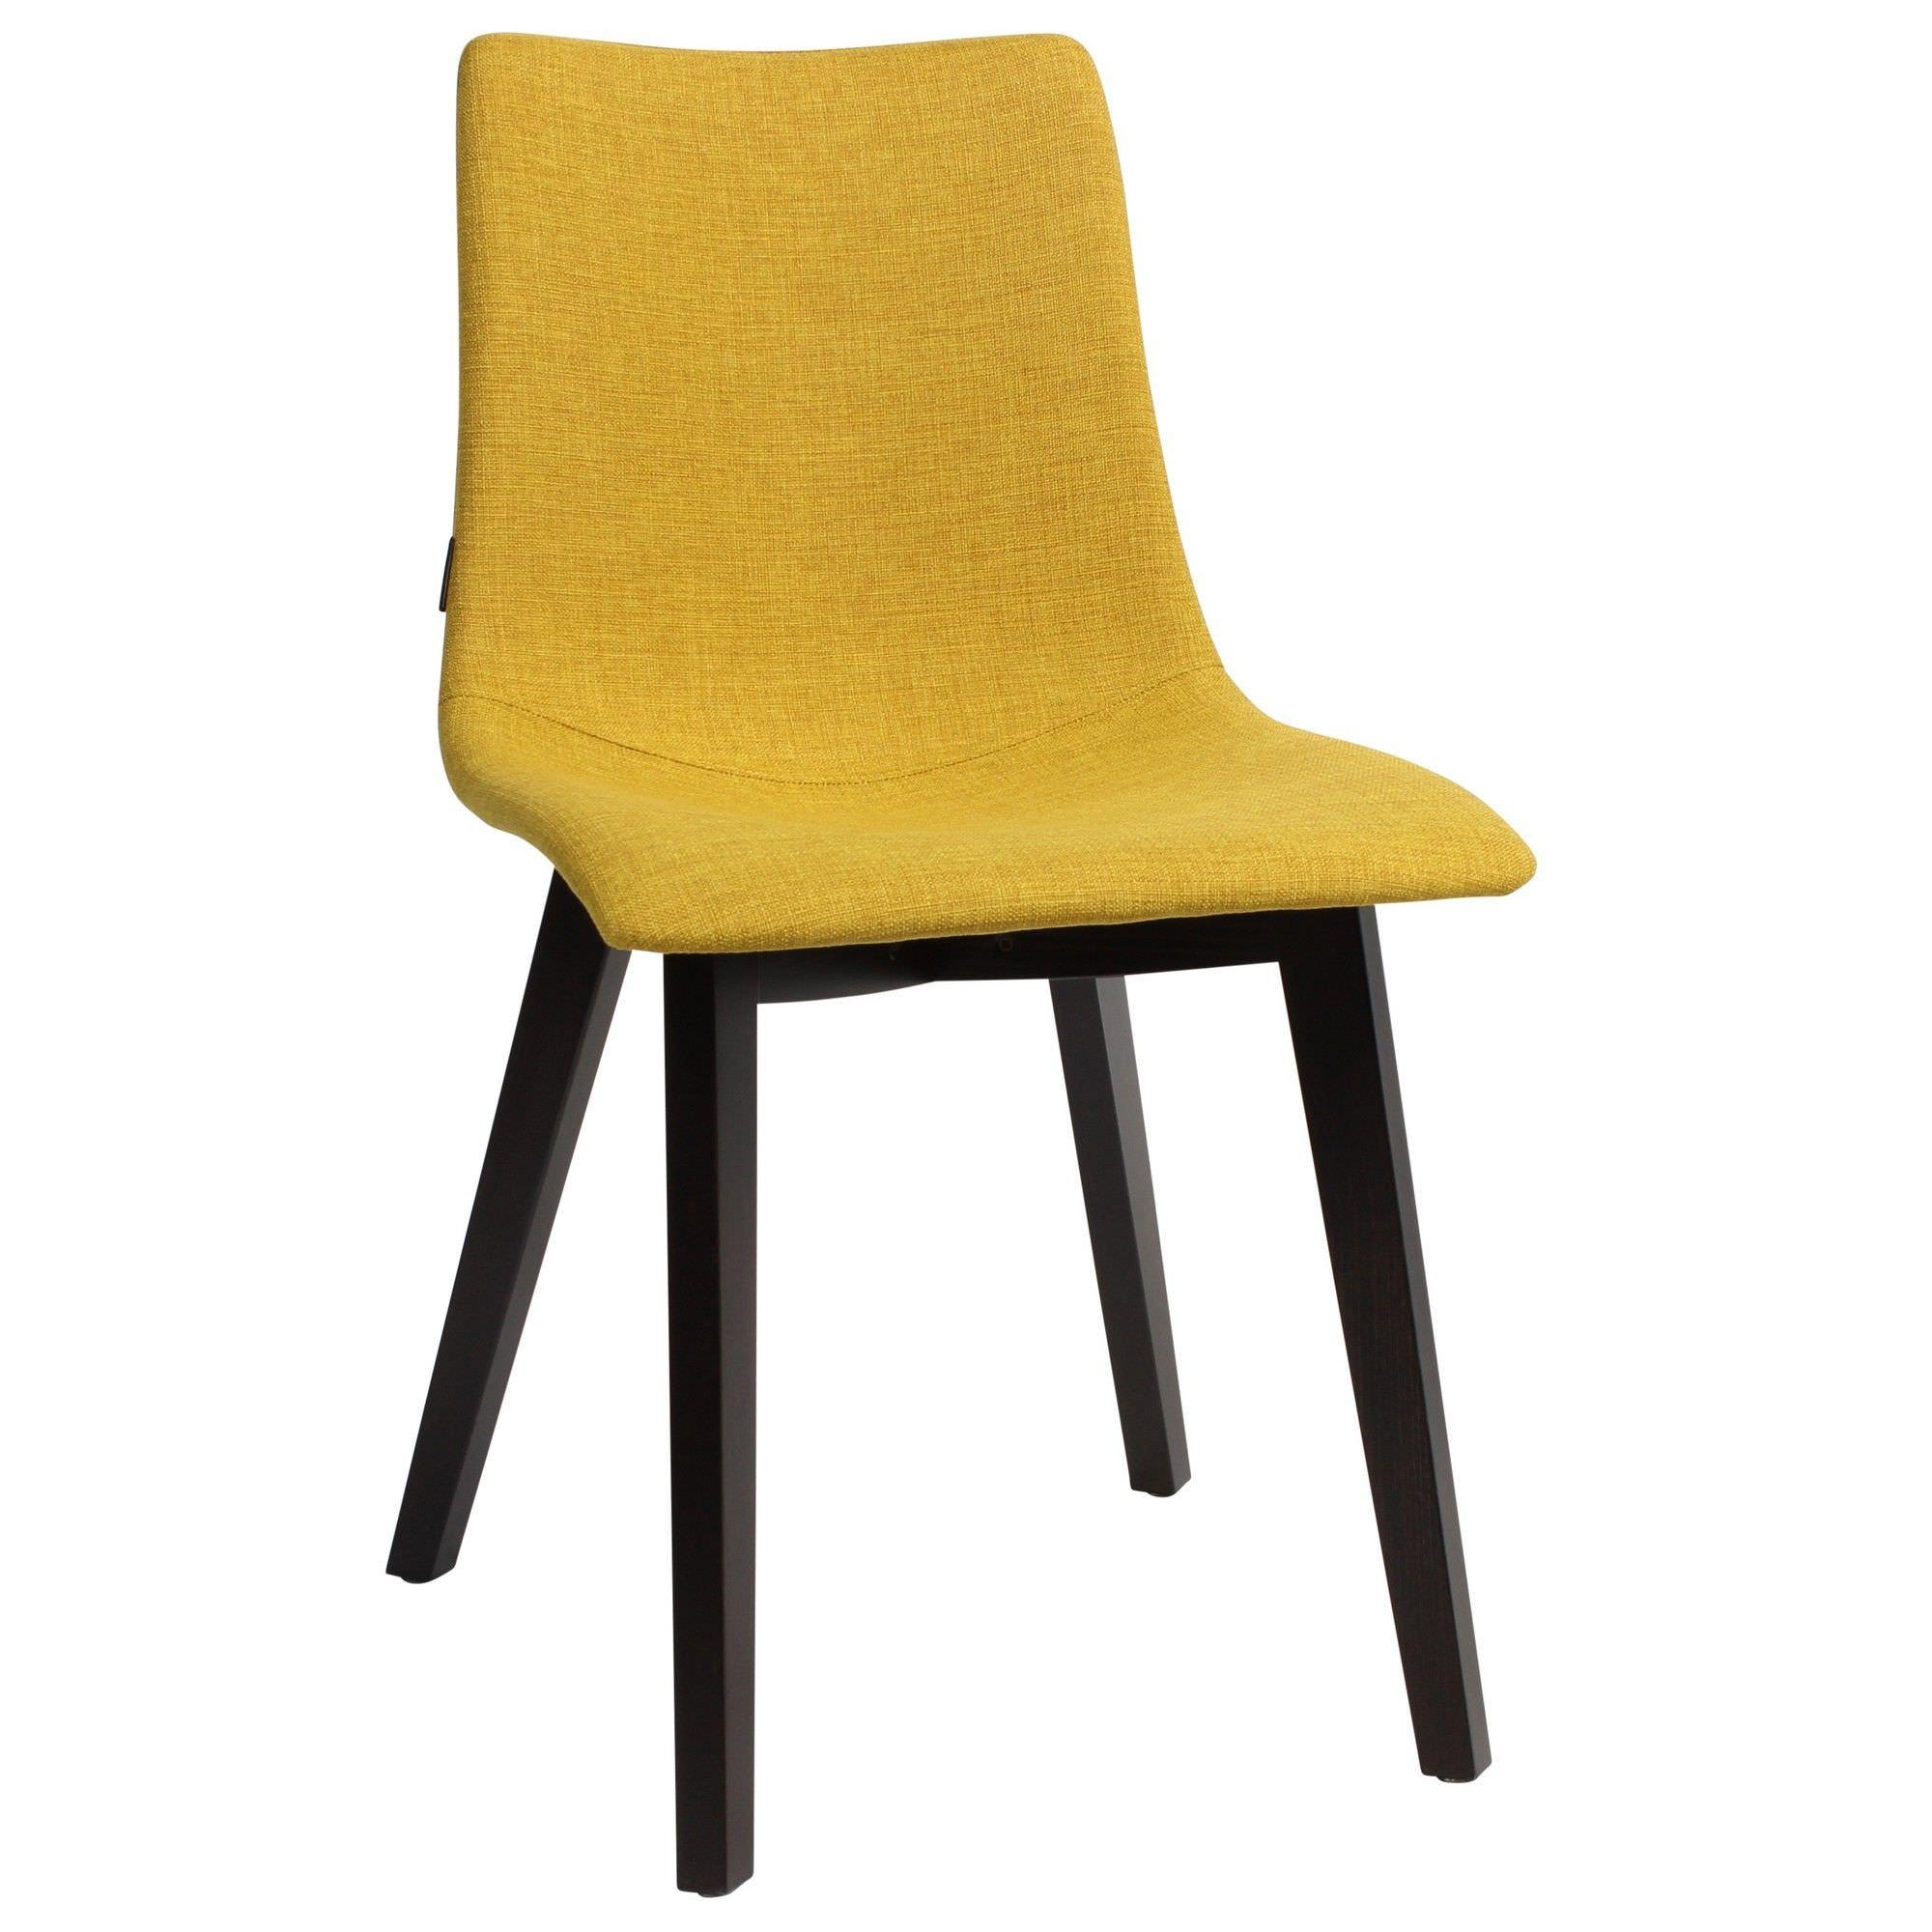 Zebra Pop Italian Made Commercial Grade Fabric Dining Chair, Timber Leg, Saffron / Wenge